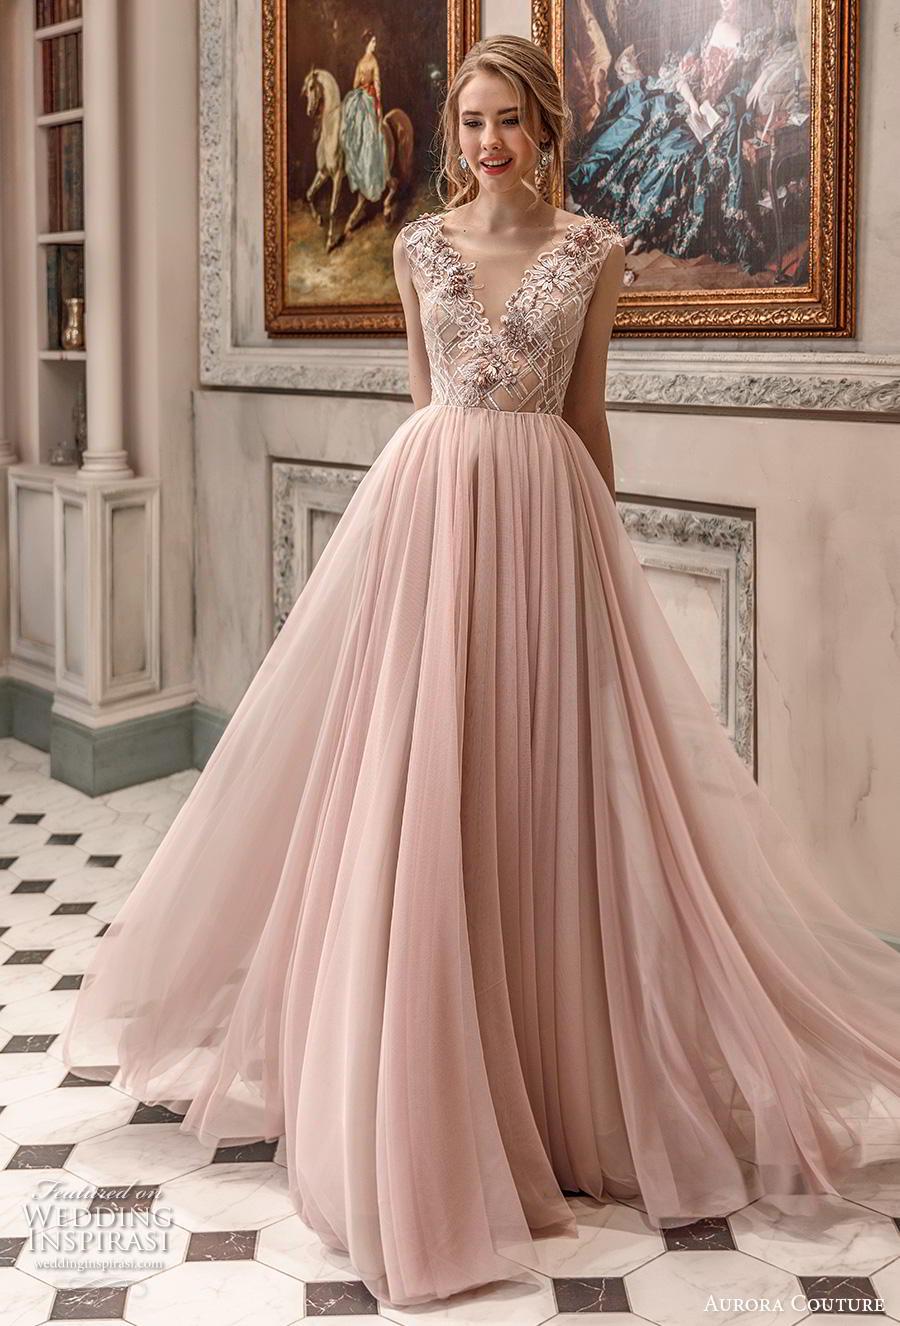 aurora couture 2019 bridal sleeveless v neck heavily embellished bodice romantic blush soft a  line wedding dress sweep train (11) mv